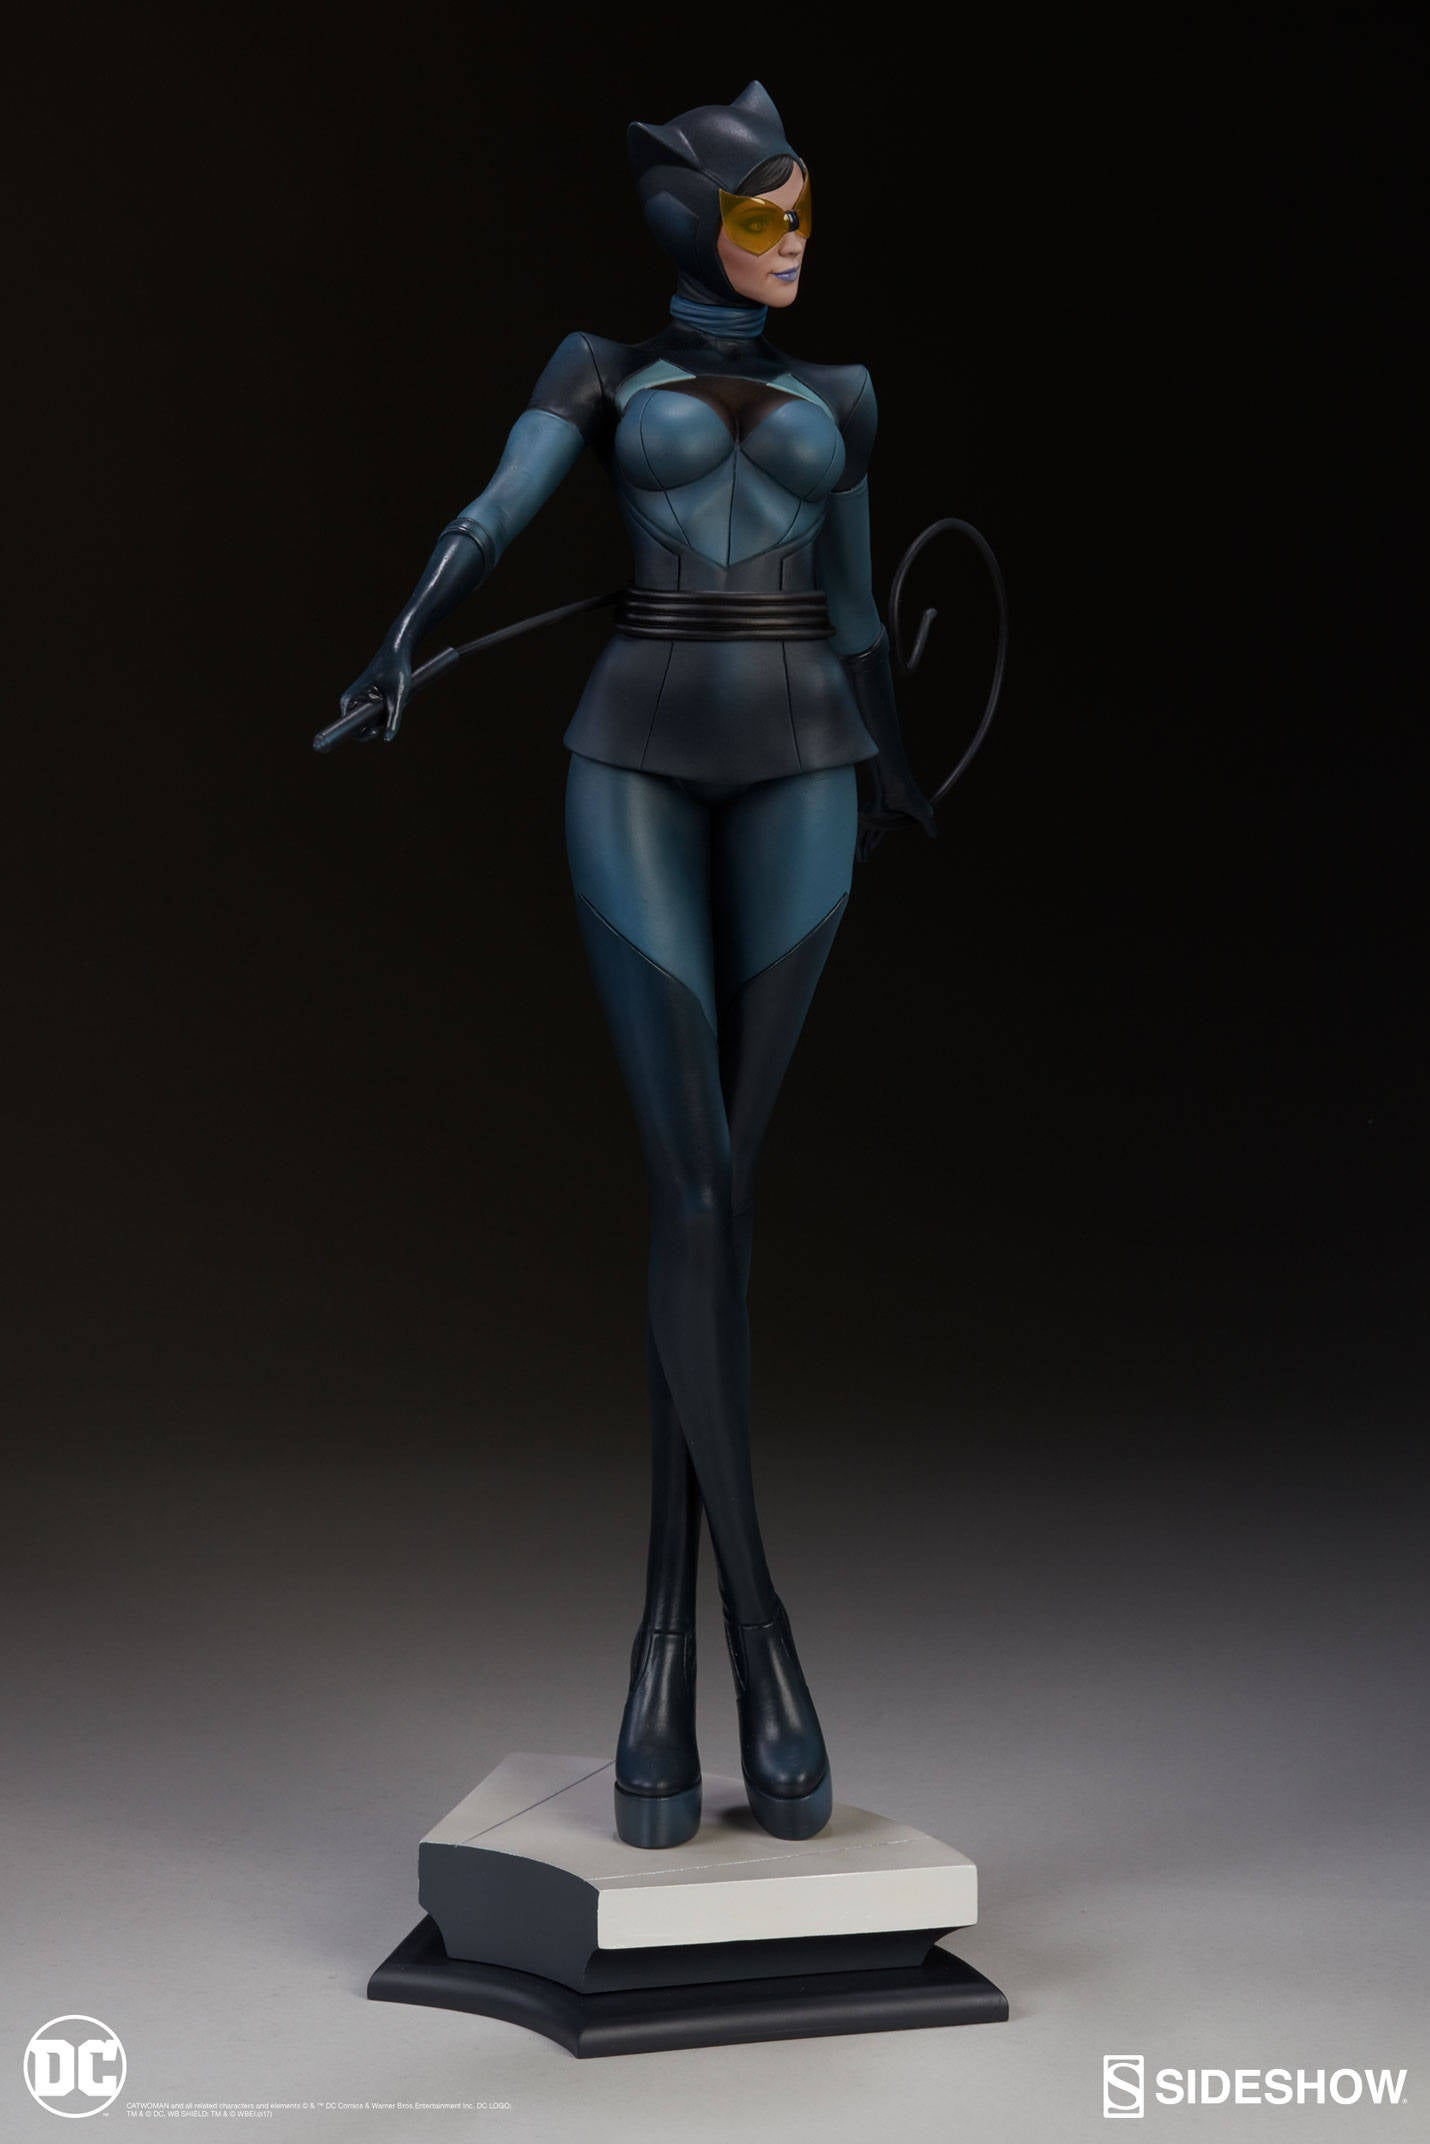 Catwoman-Sideshow-Artgerm-Statue06